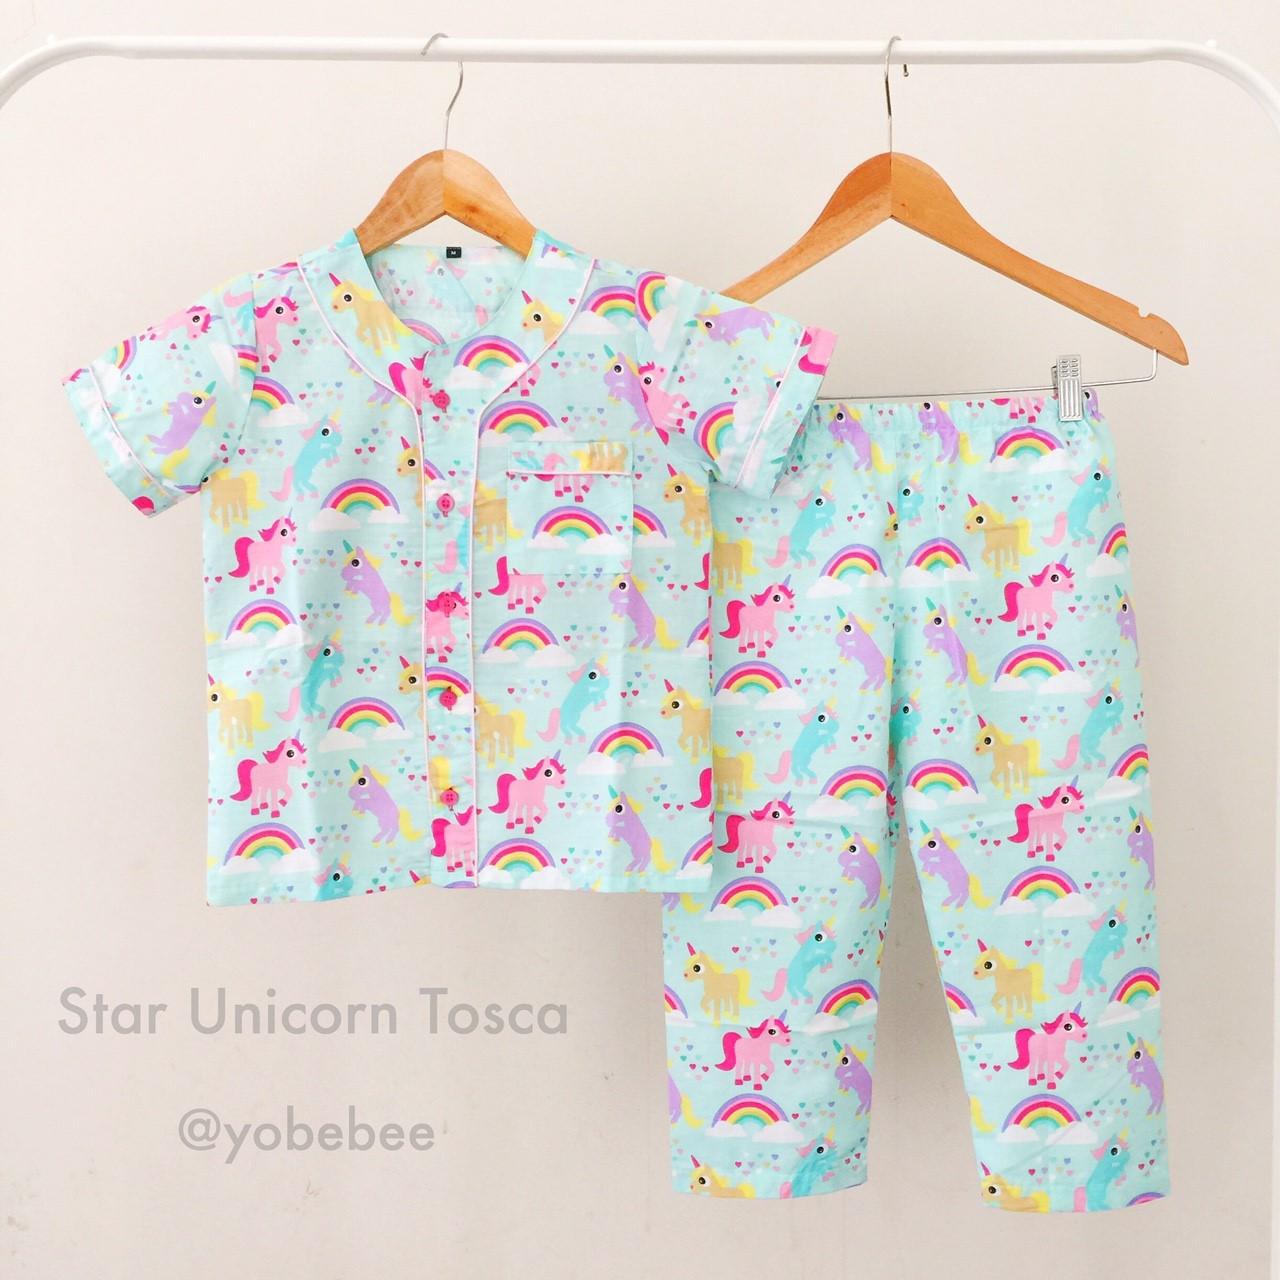 Jual Baju Tidur Anak SIZE XL - Piyama Anak - Grosir Piyama - Grosir piyama anak